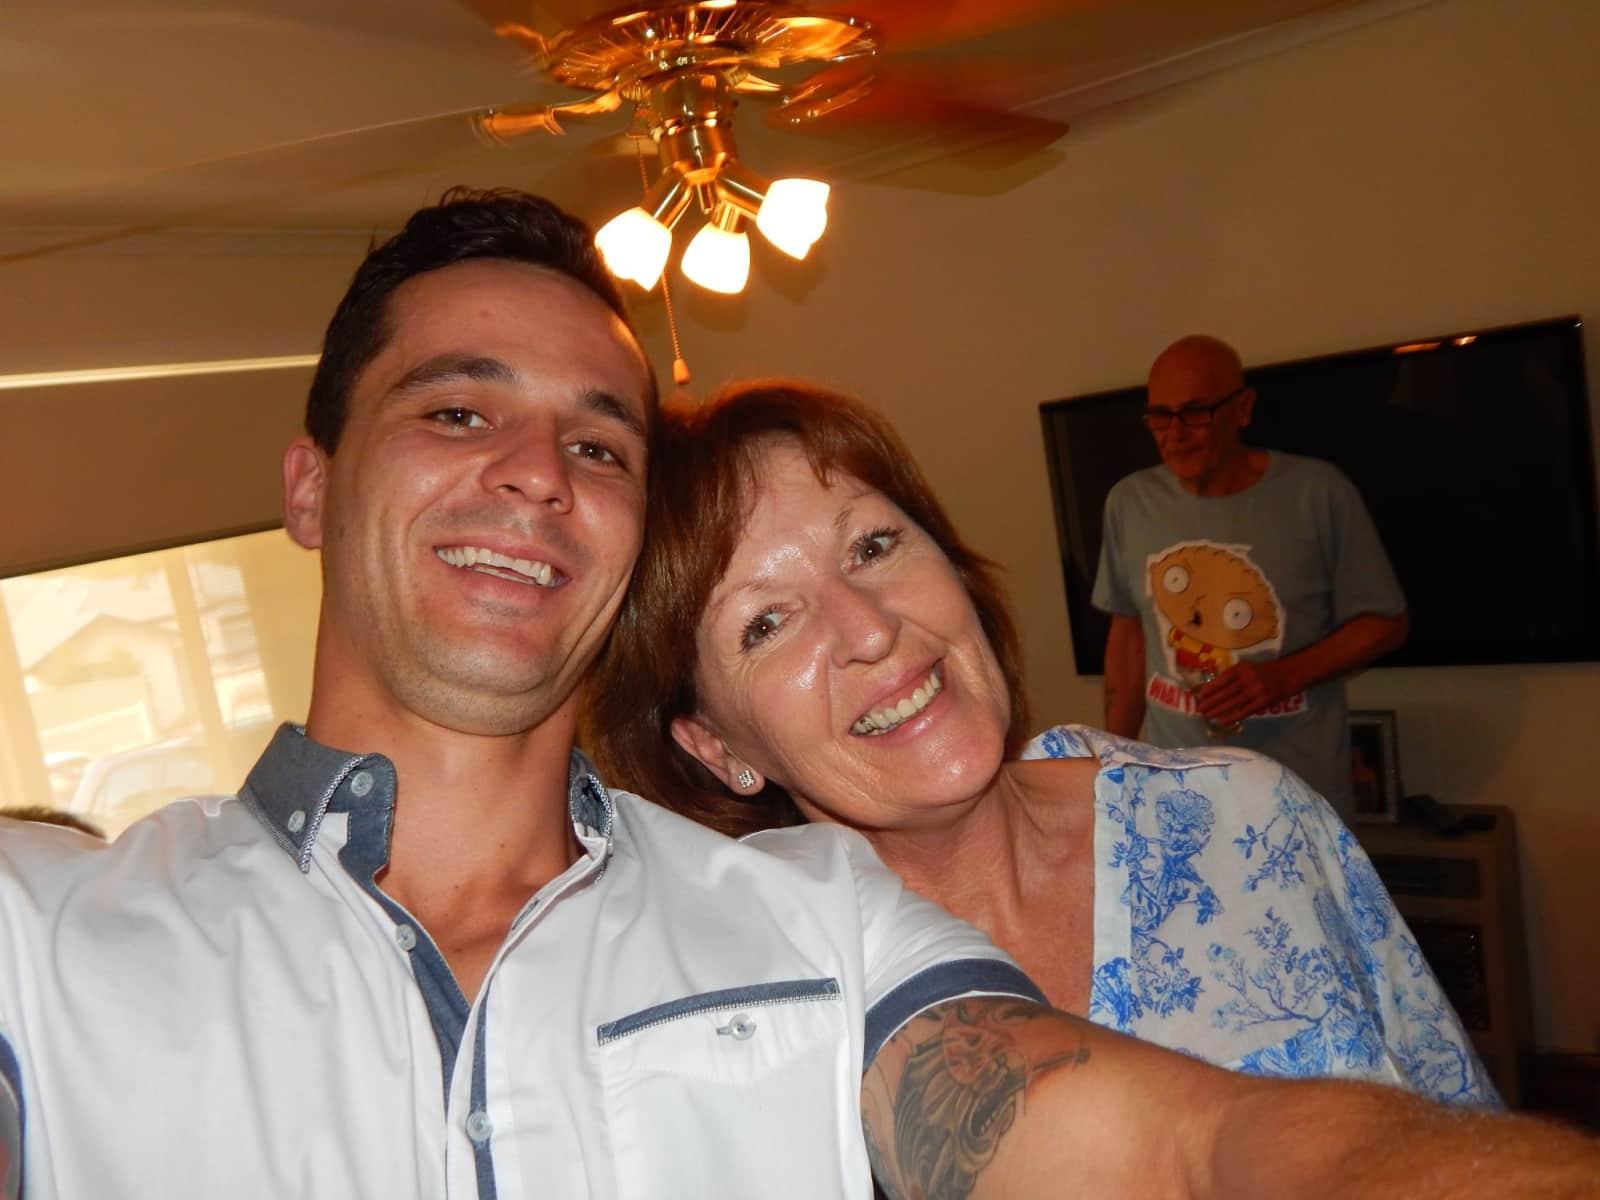 Susan from Adelaide, South Australia, Australia